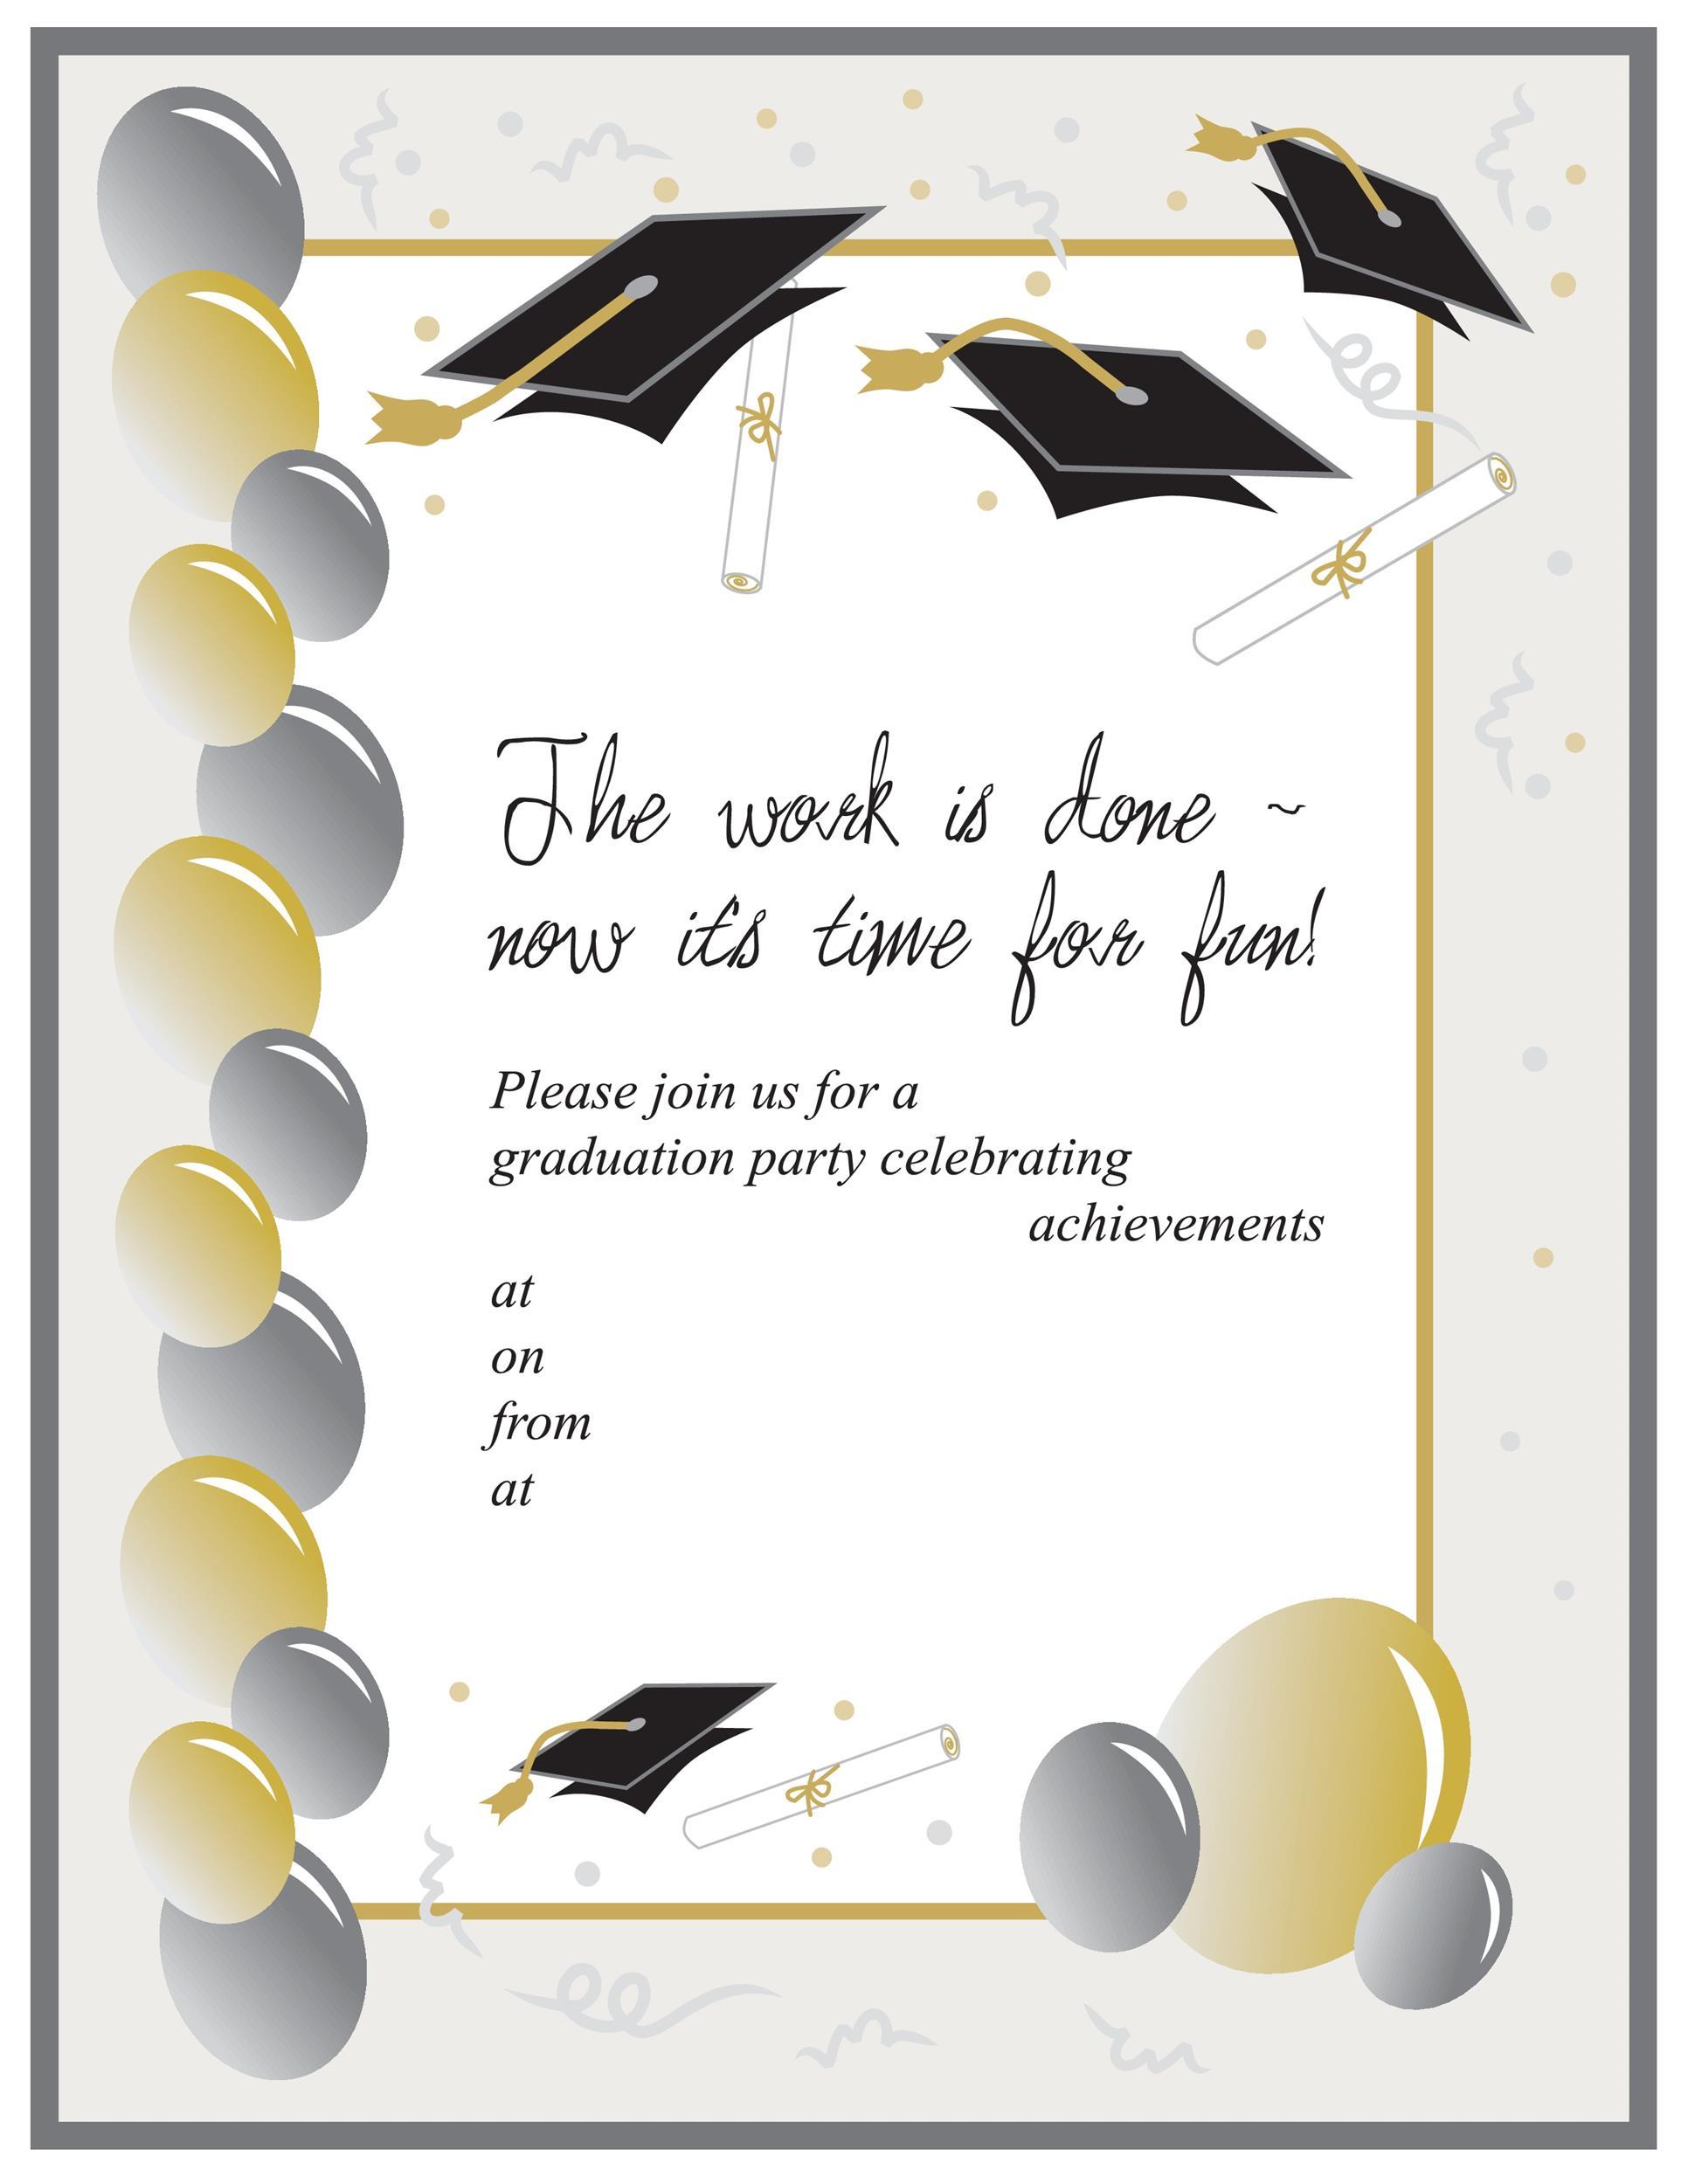 Free Graduation Invitation Templates 02